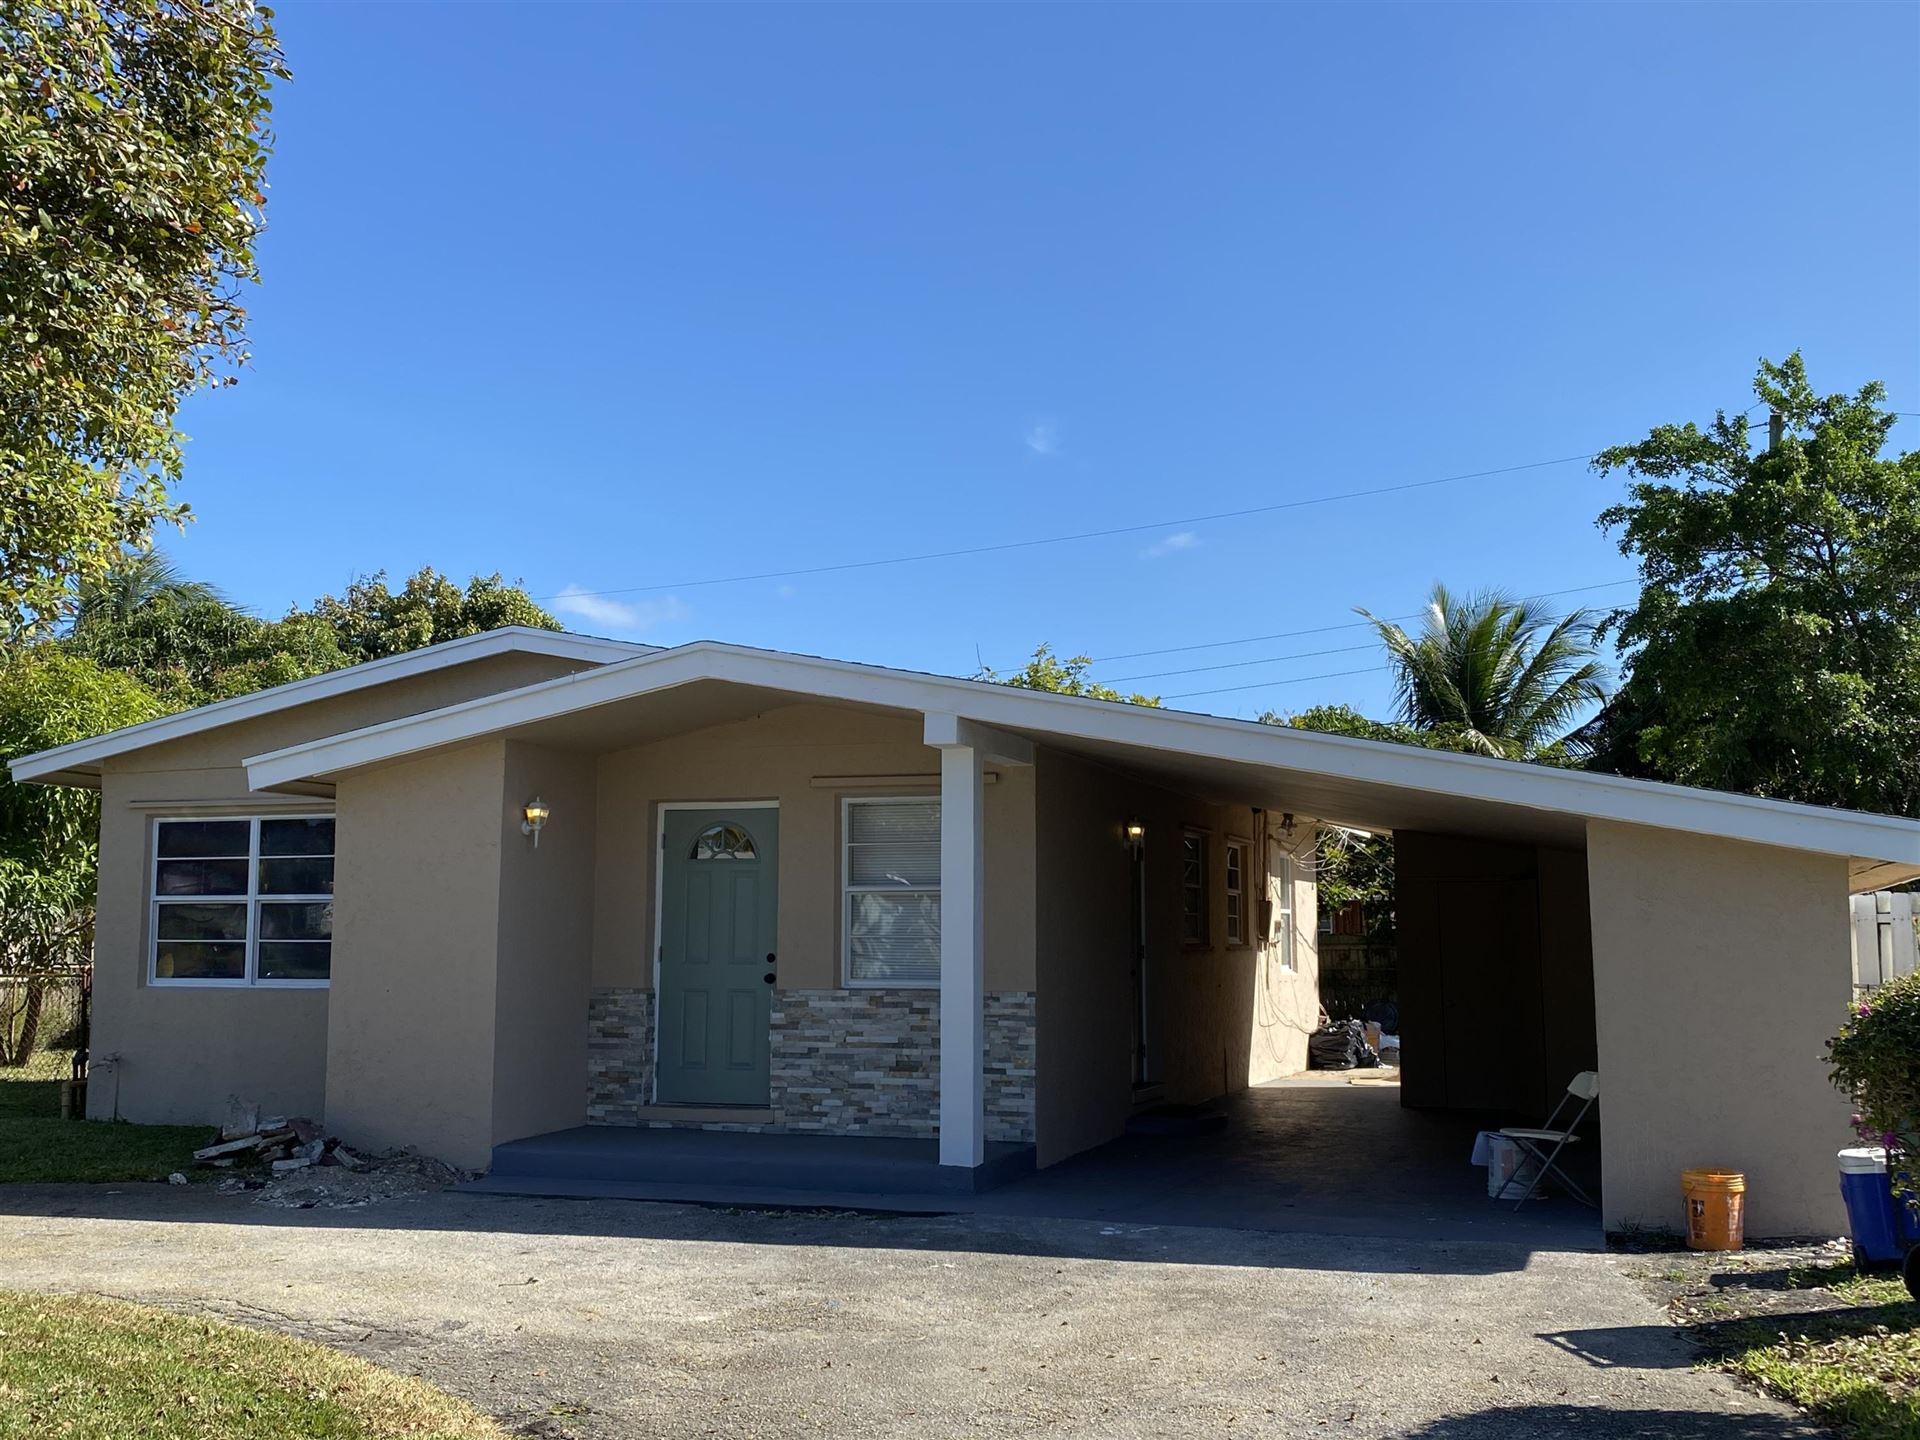 324 NE 15th Avenue, Boynton Beach, FL 33435 - #: RX-10610118